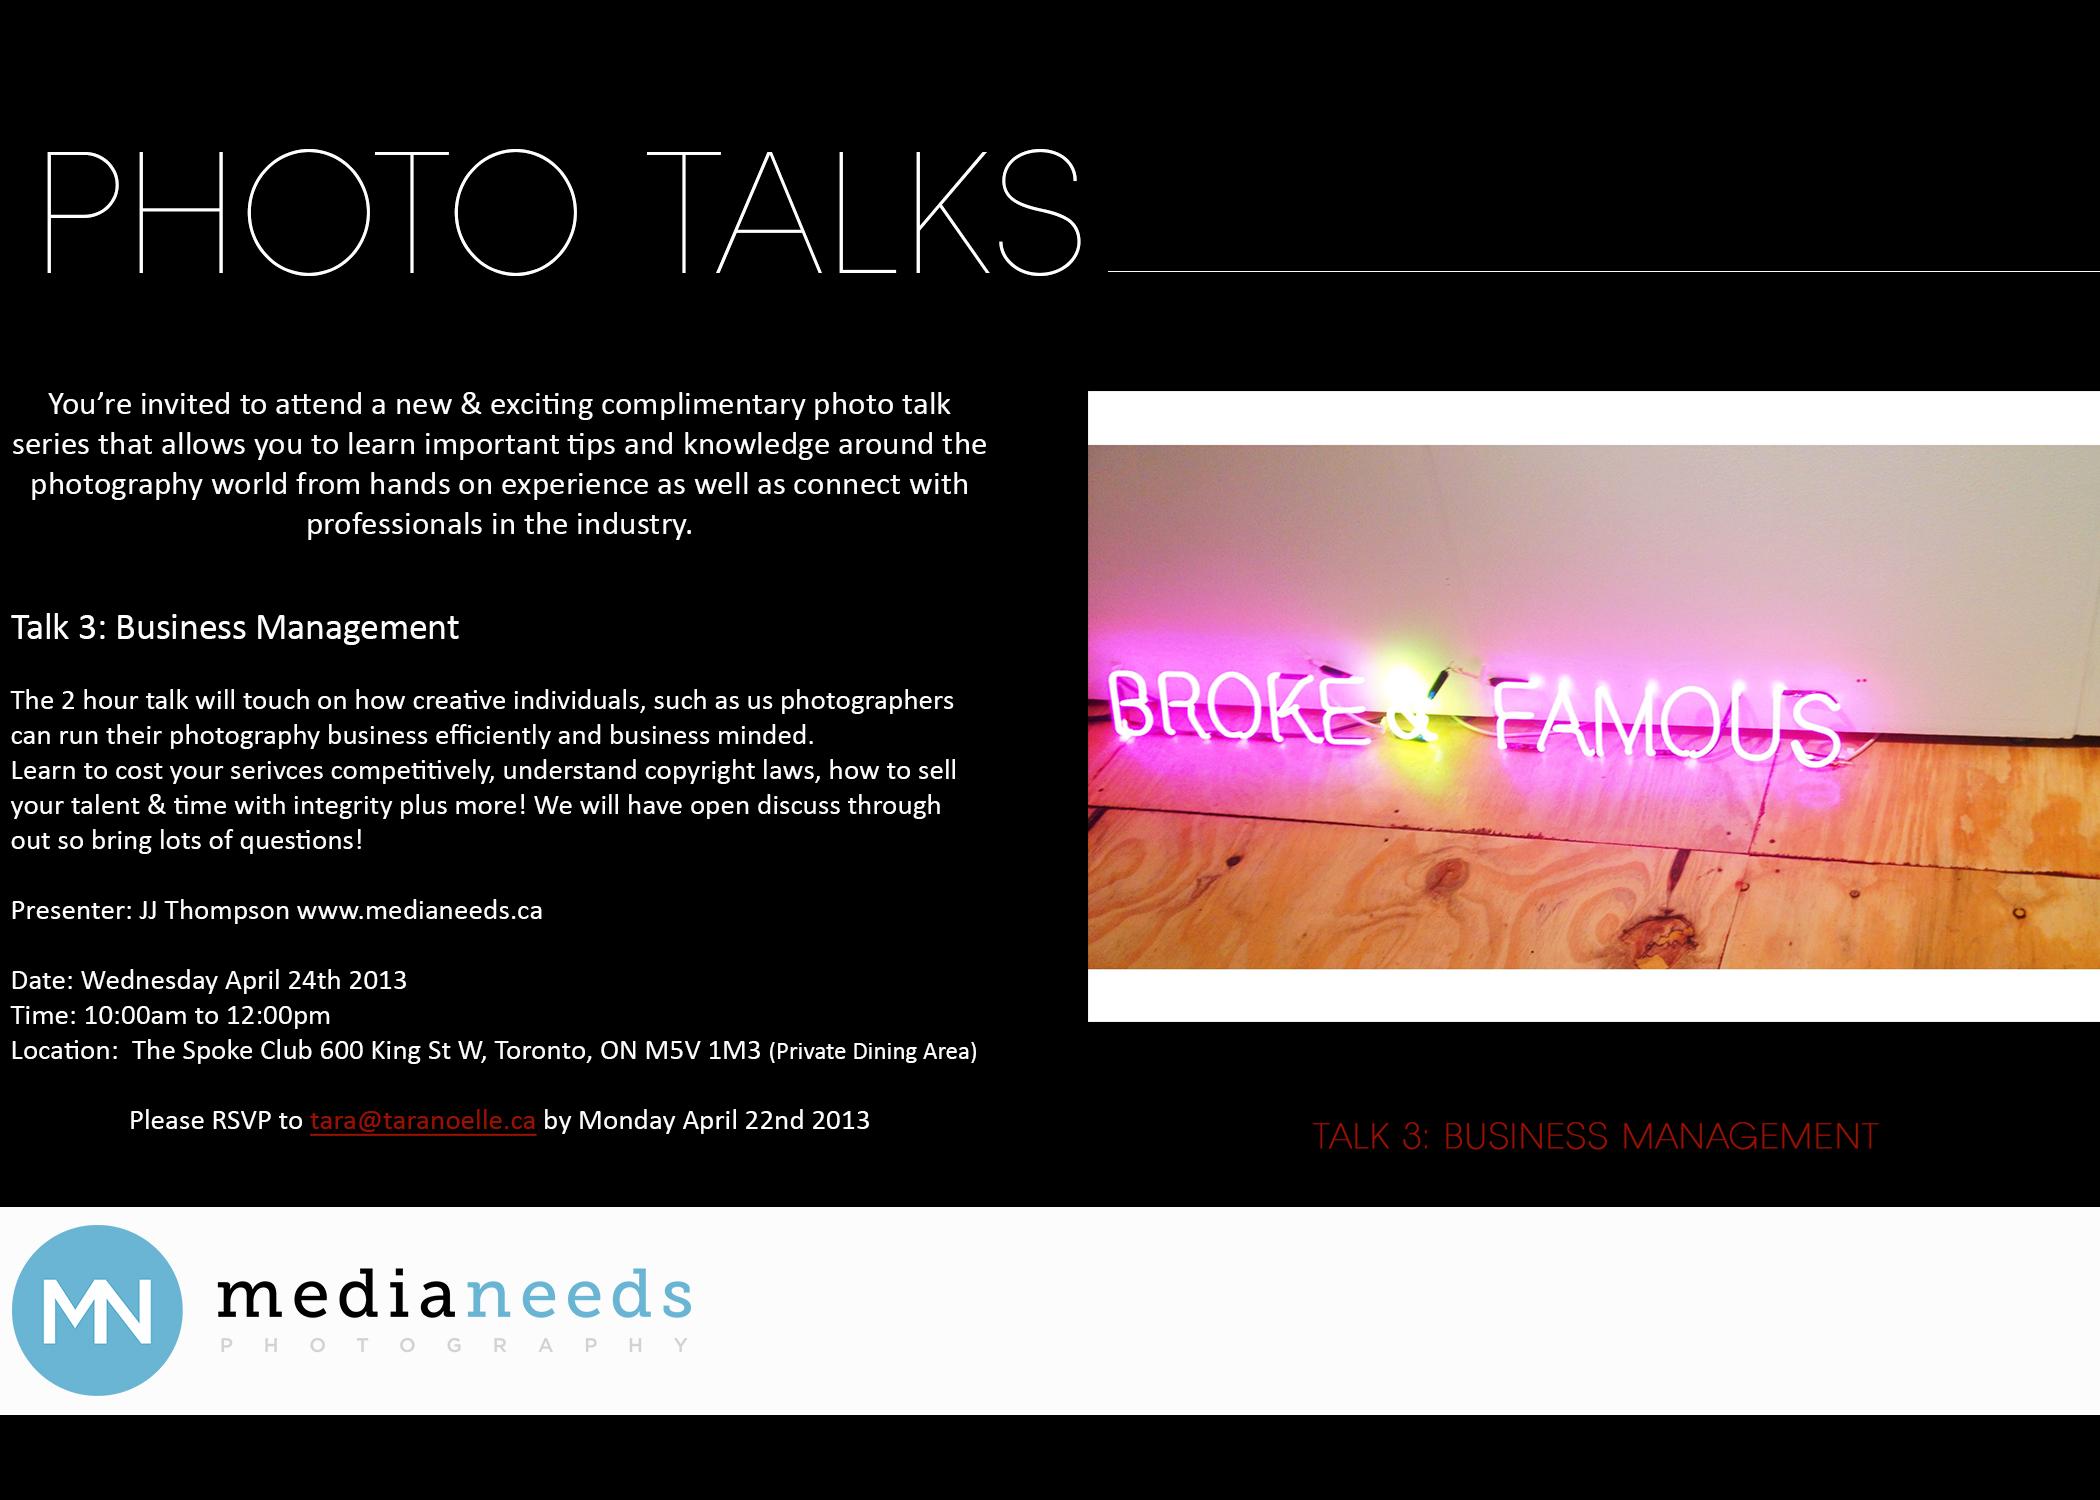 Invite Photo Talk 3 Business Management.jpg